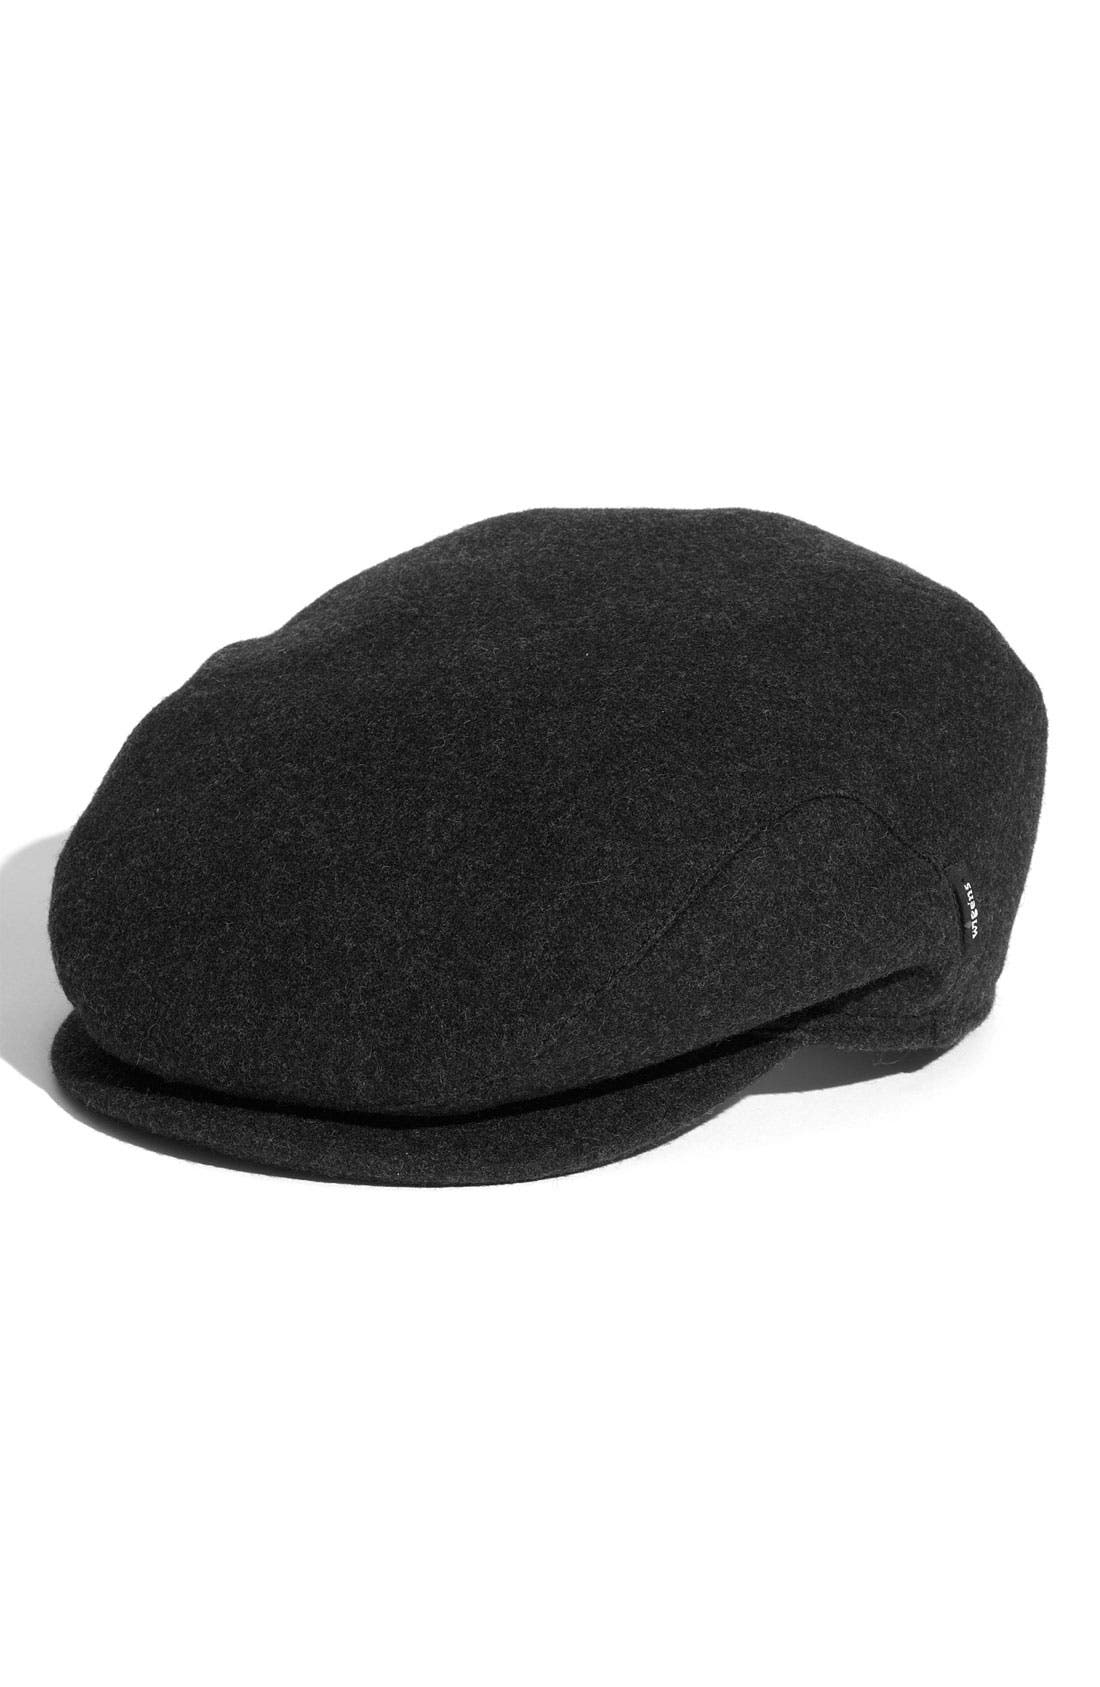 Main Image - Wigens Earflap Wool Driving Cap